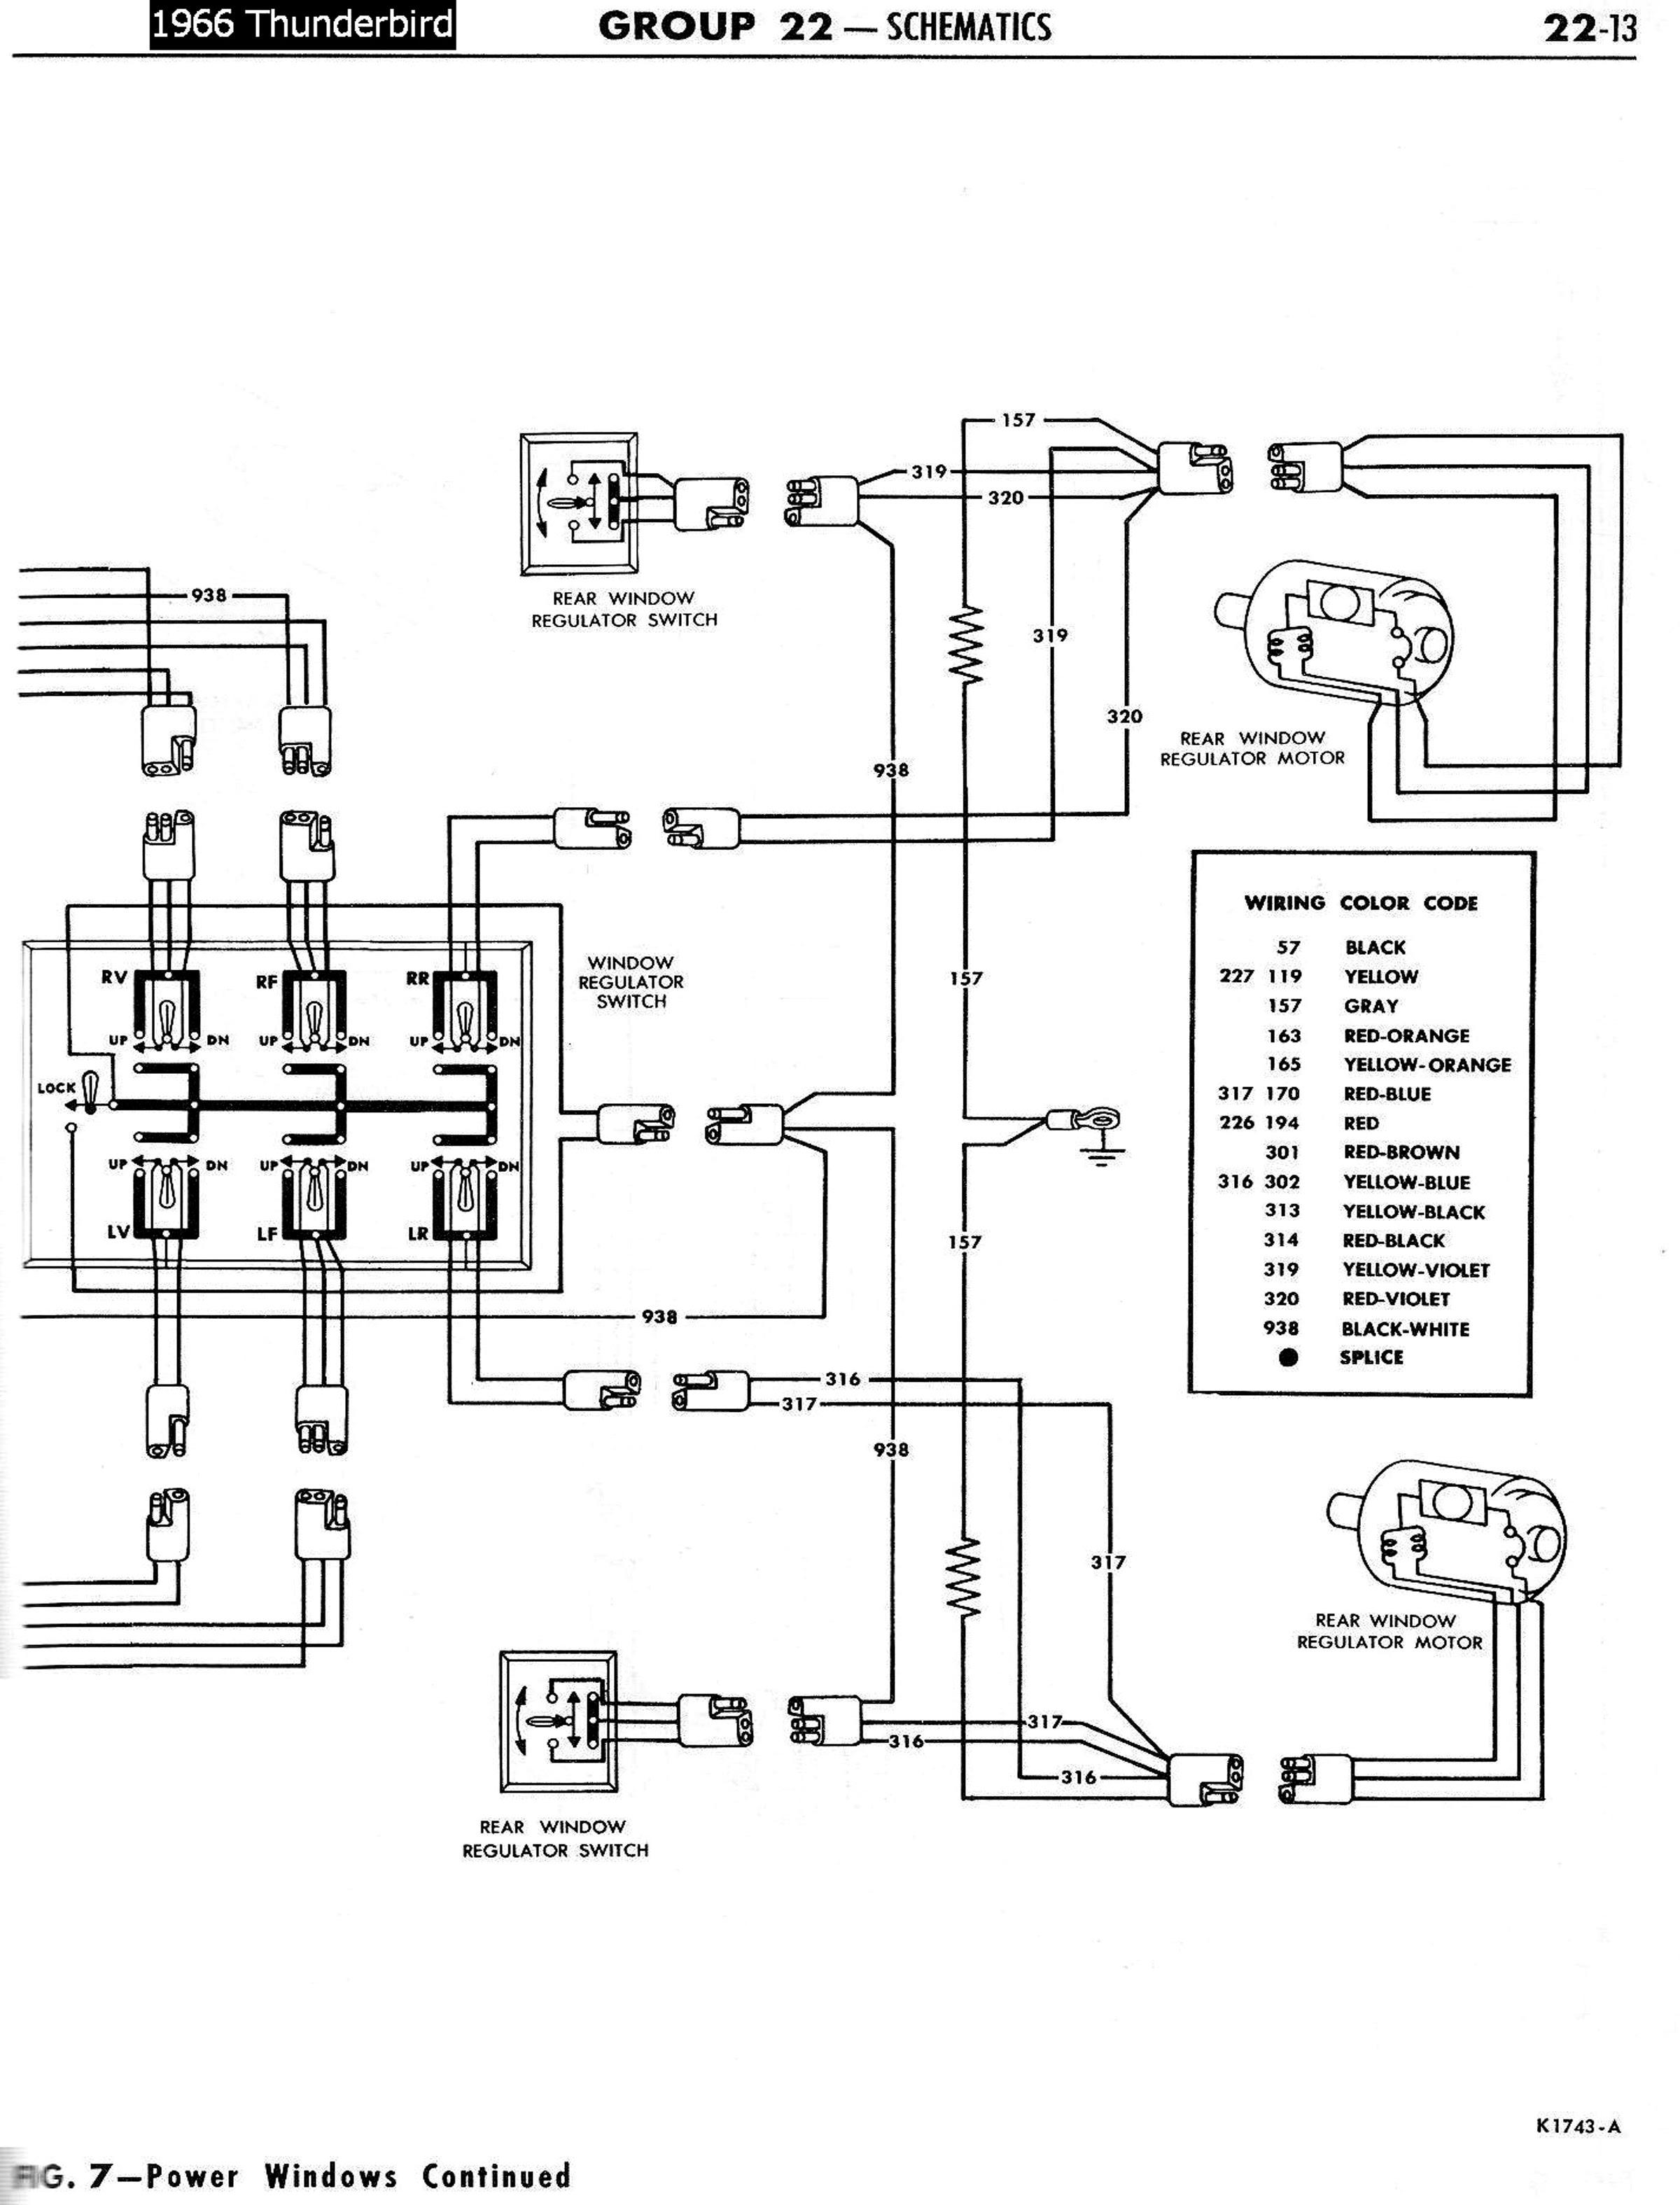 Diagram Ford F100 Radio Wiring Diagram Full Version Hd Quality Wiring Diagram Schematic Pr Media90 It